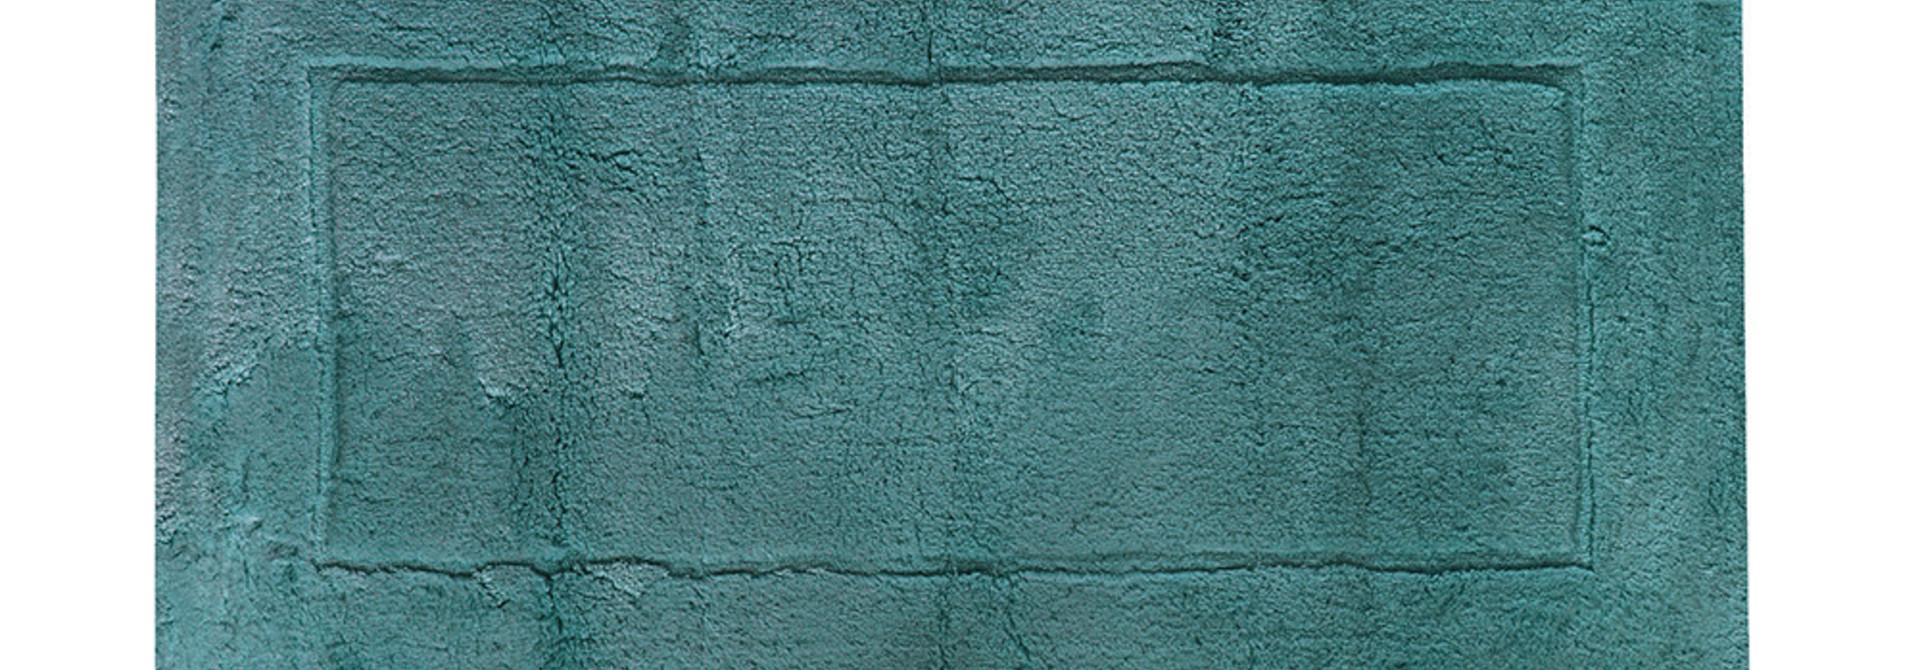 Bath Mat - Double - Turquoise